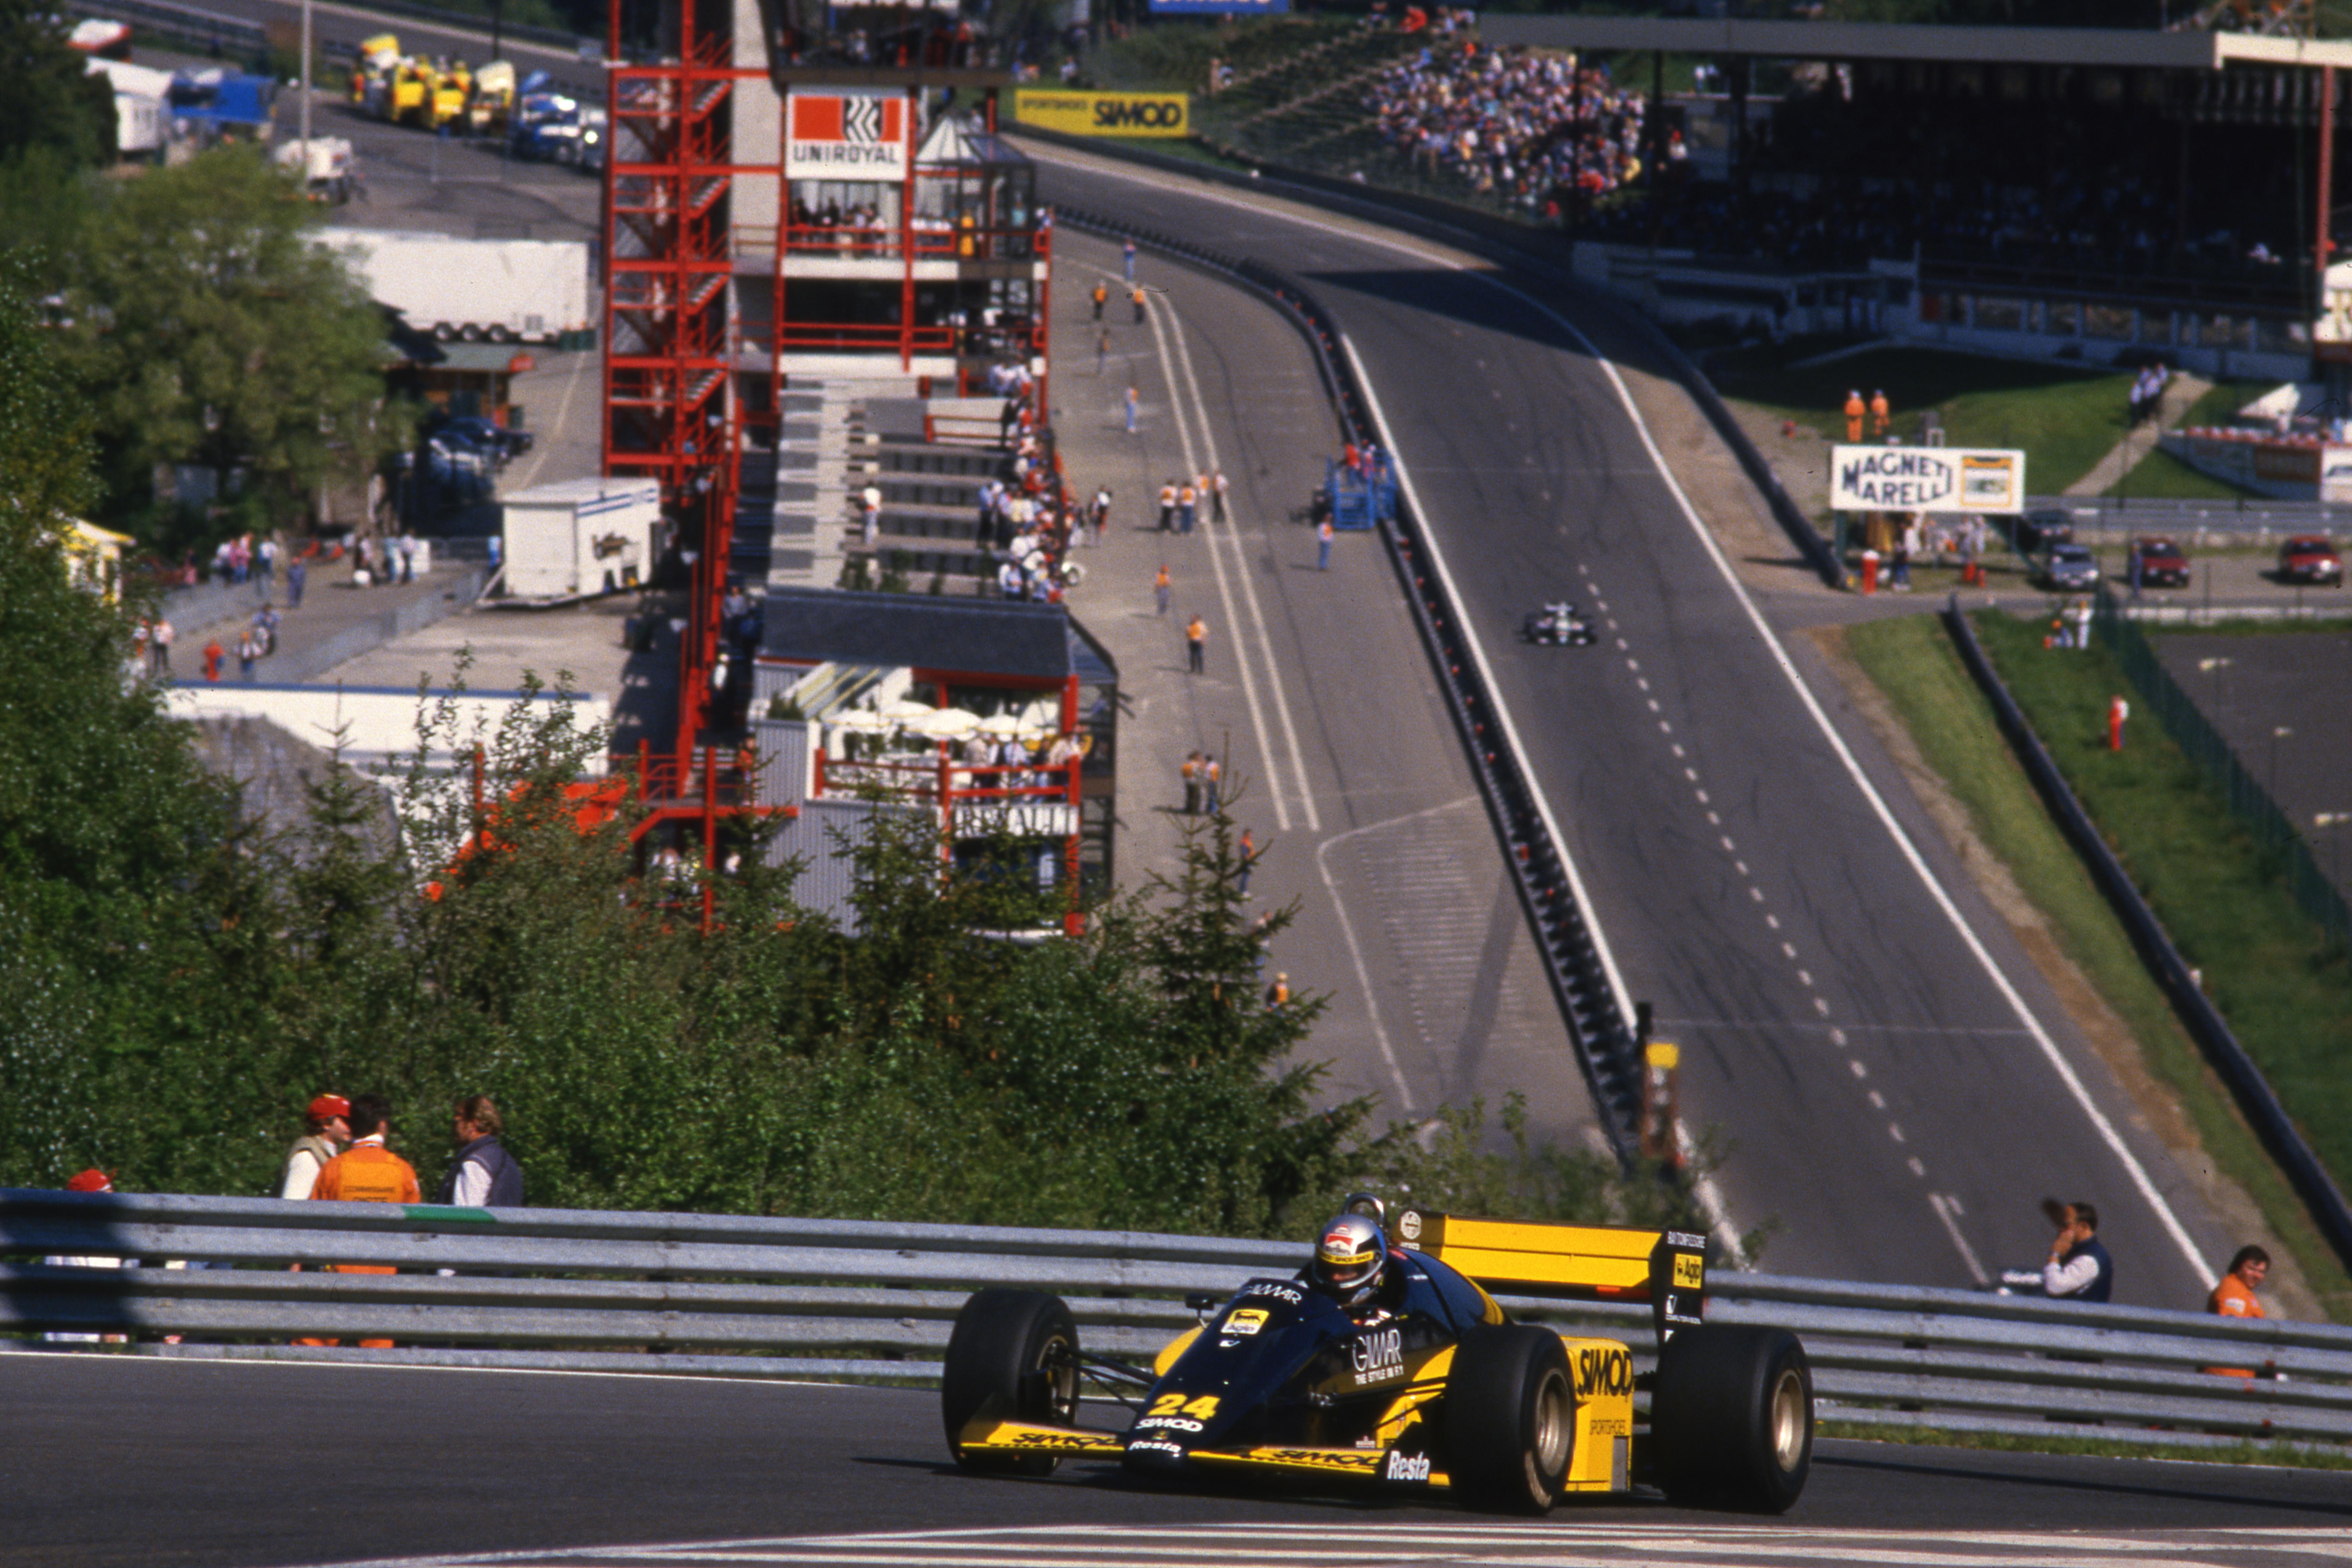 Belgian Grand Prix Spa Francorchamps (bel) 23 25 05 1986